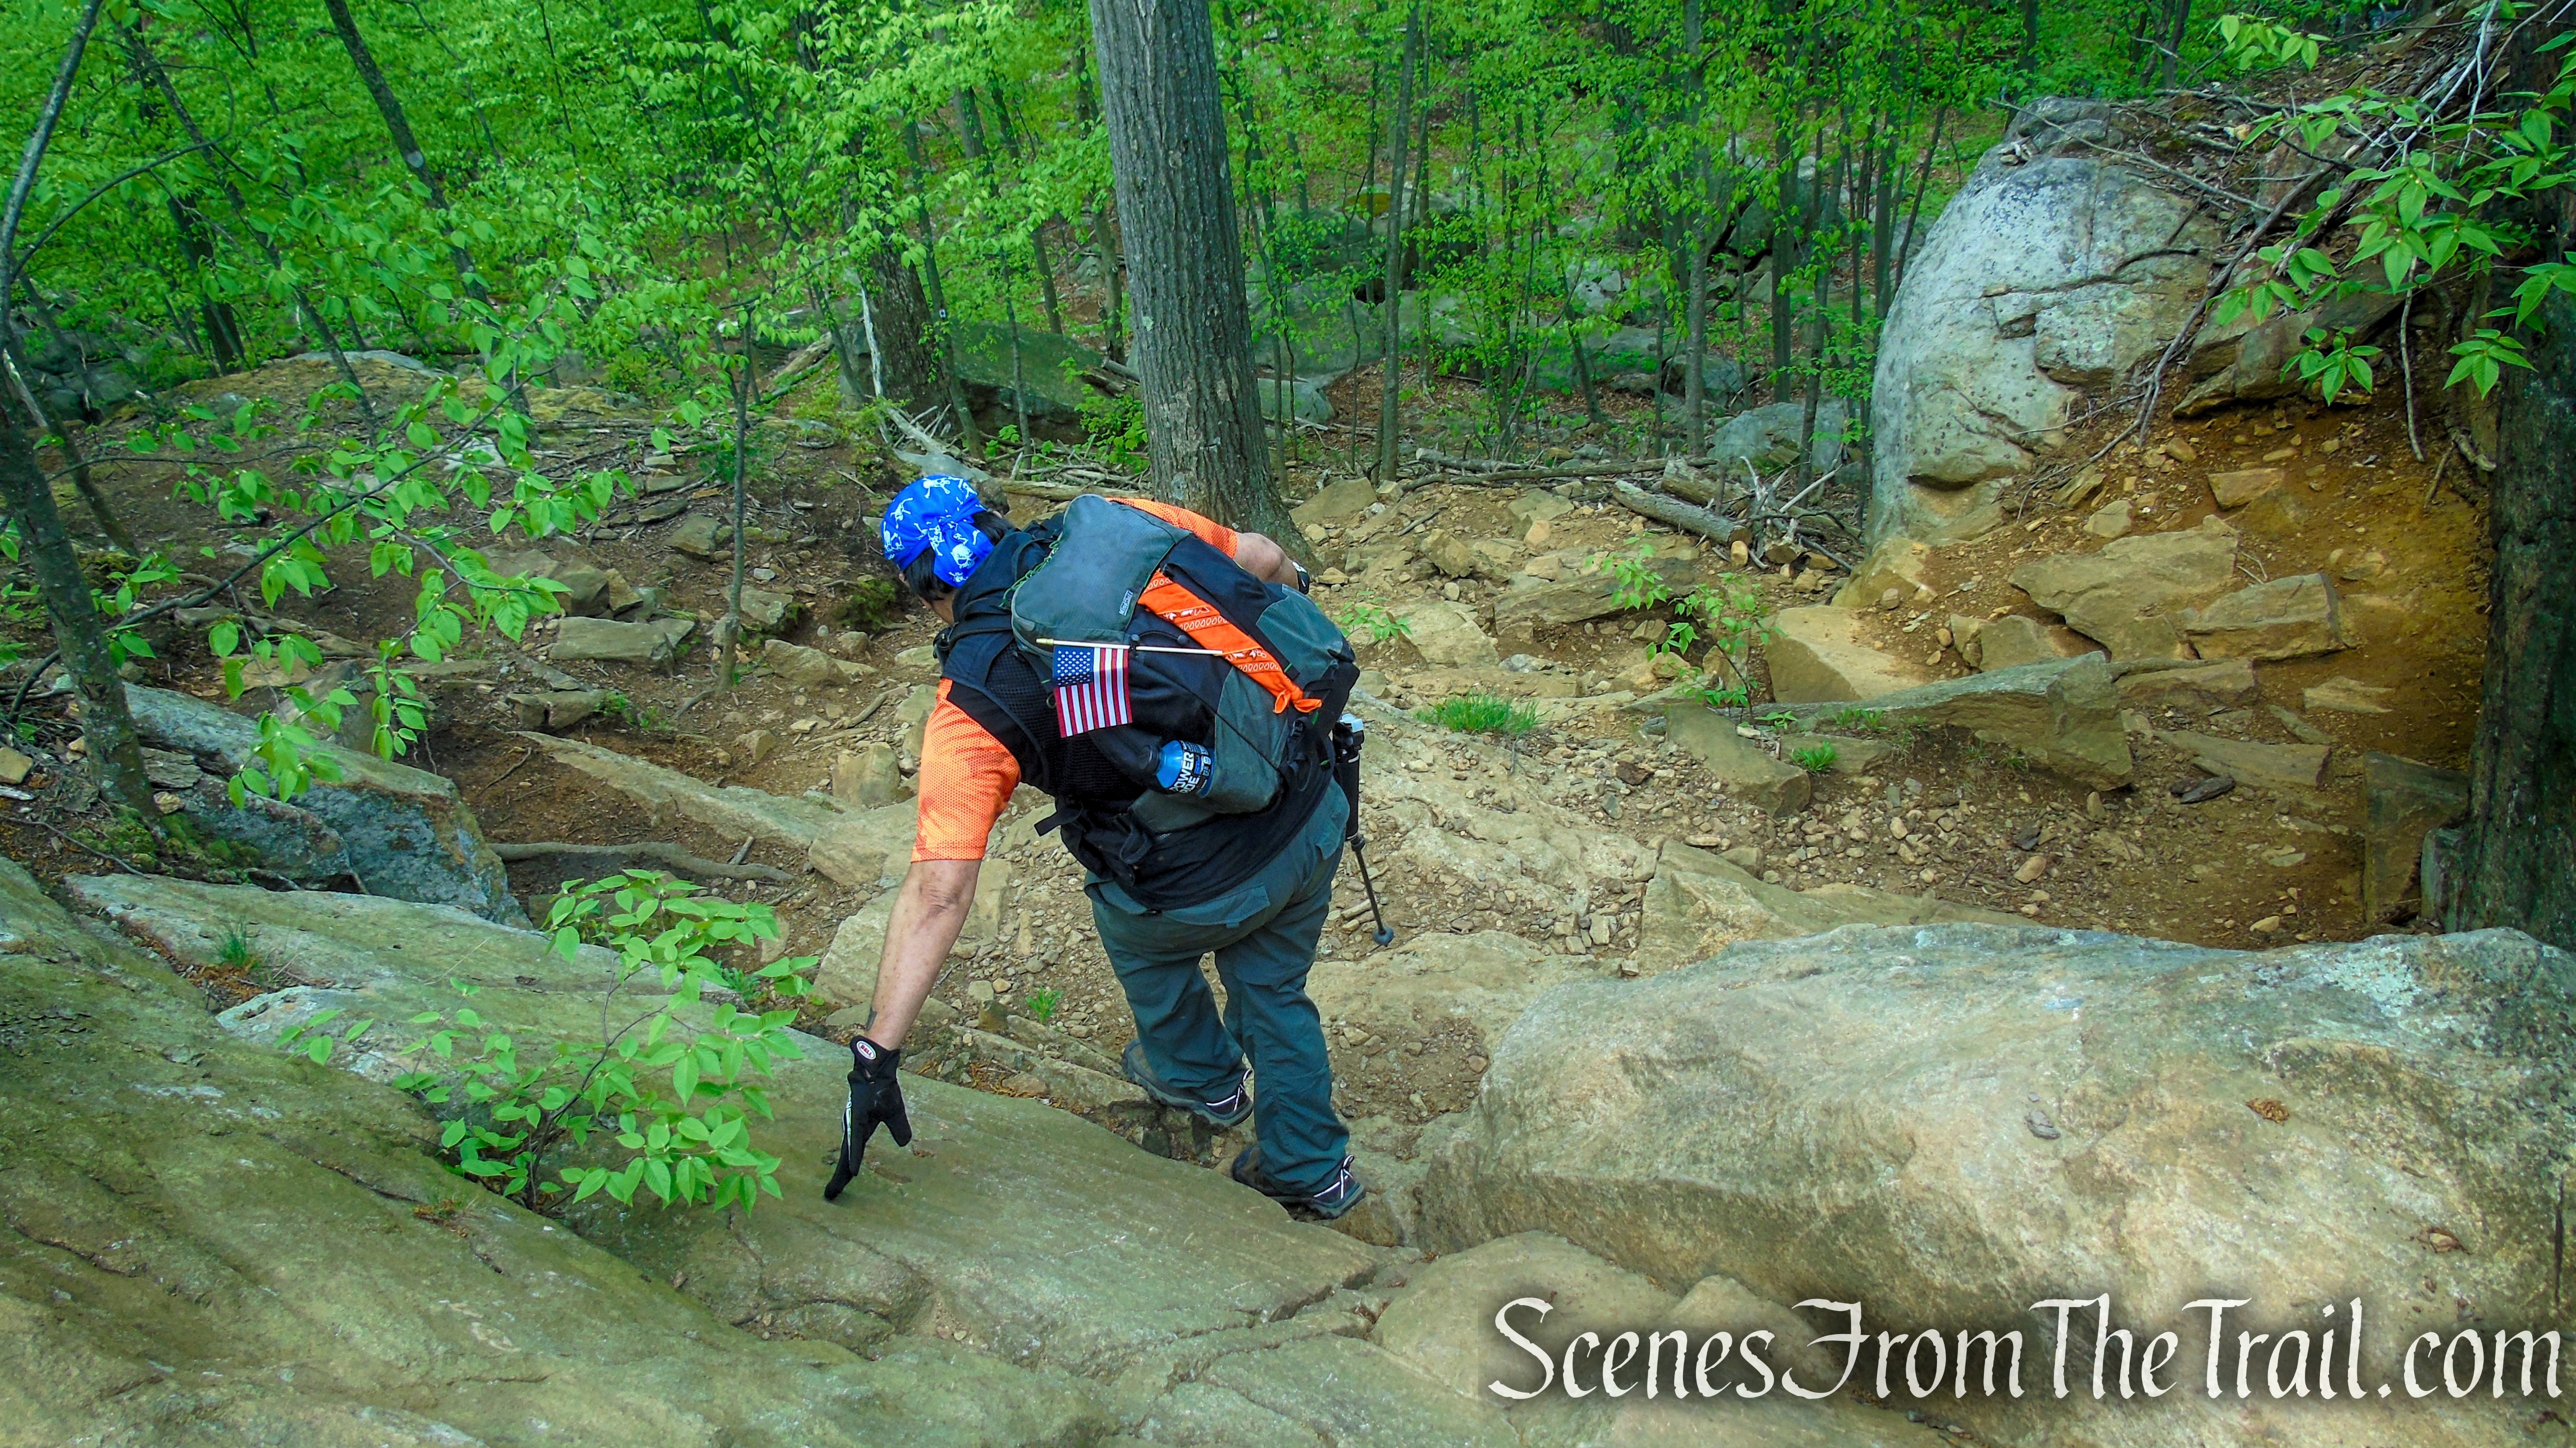 Blue Disc Trail - Harriman State Park